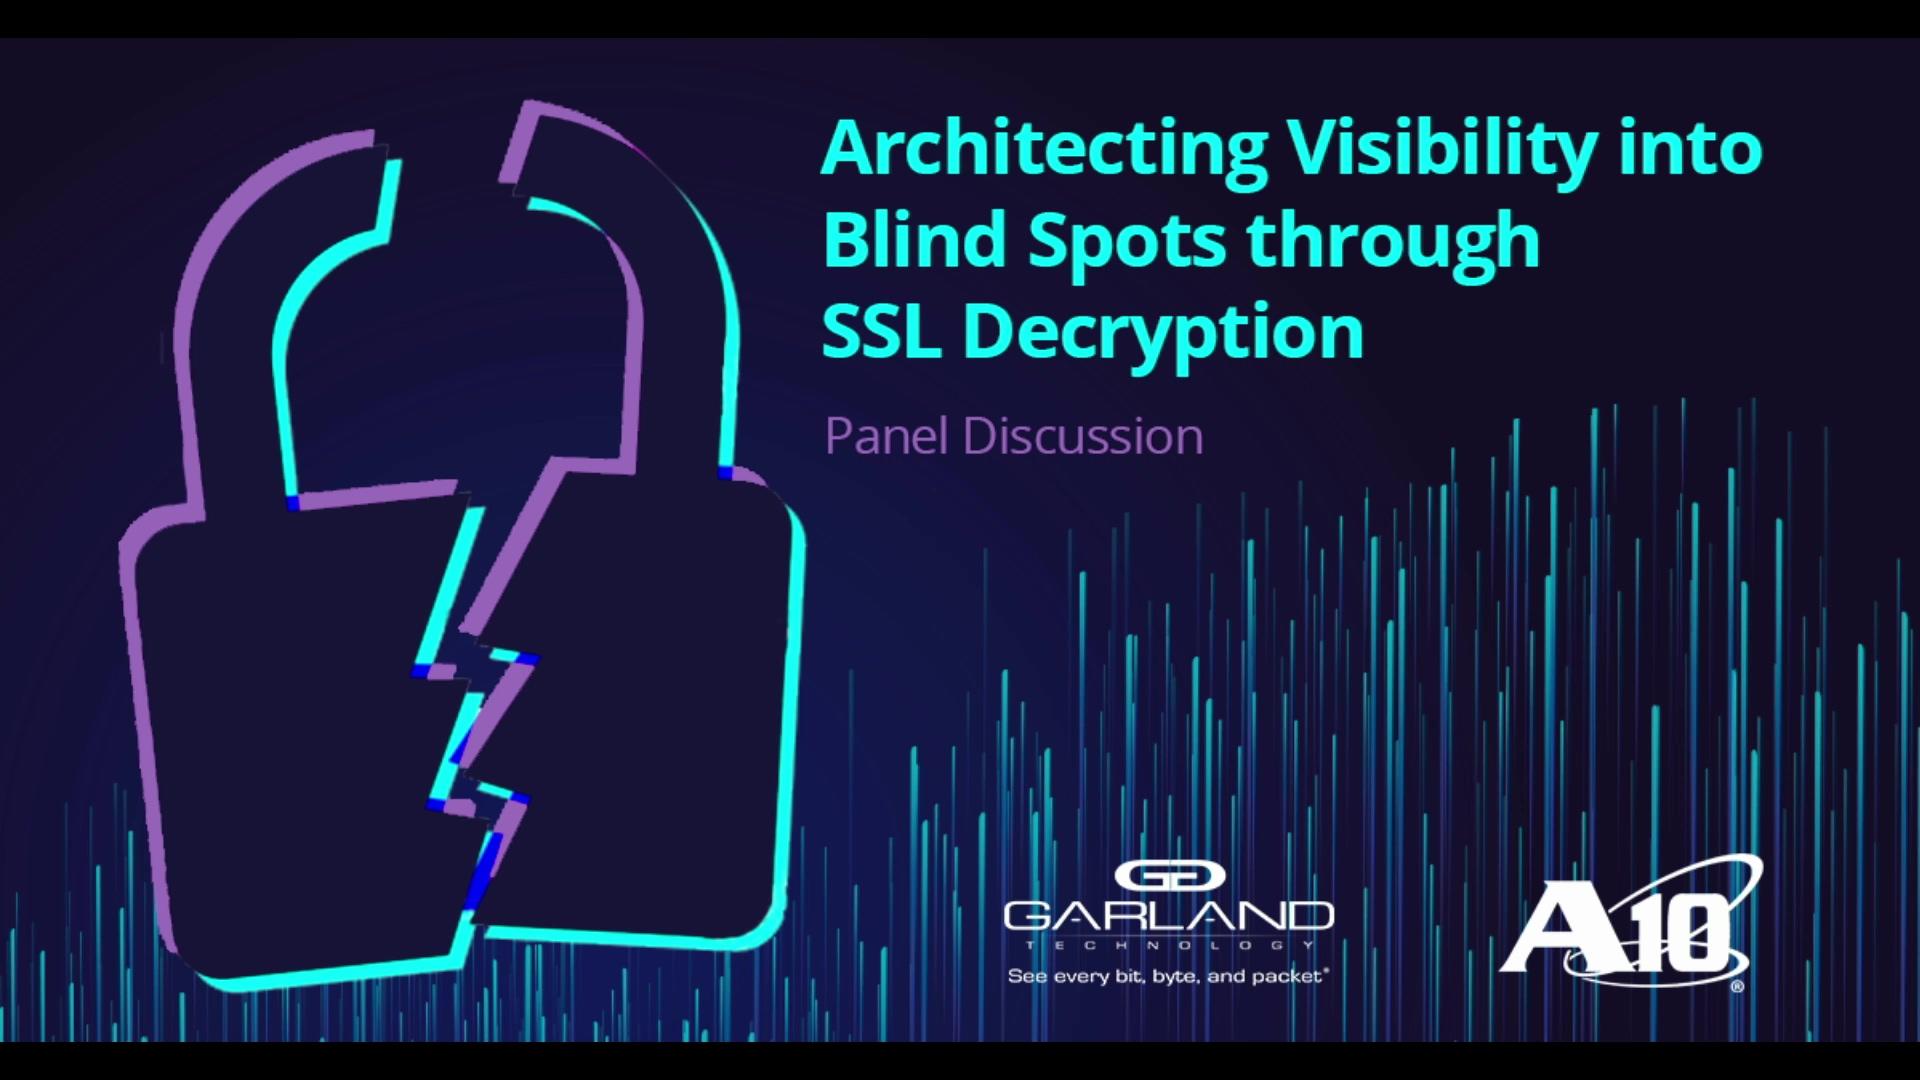 Architecting visibility into blindspots through SSL decryption